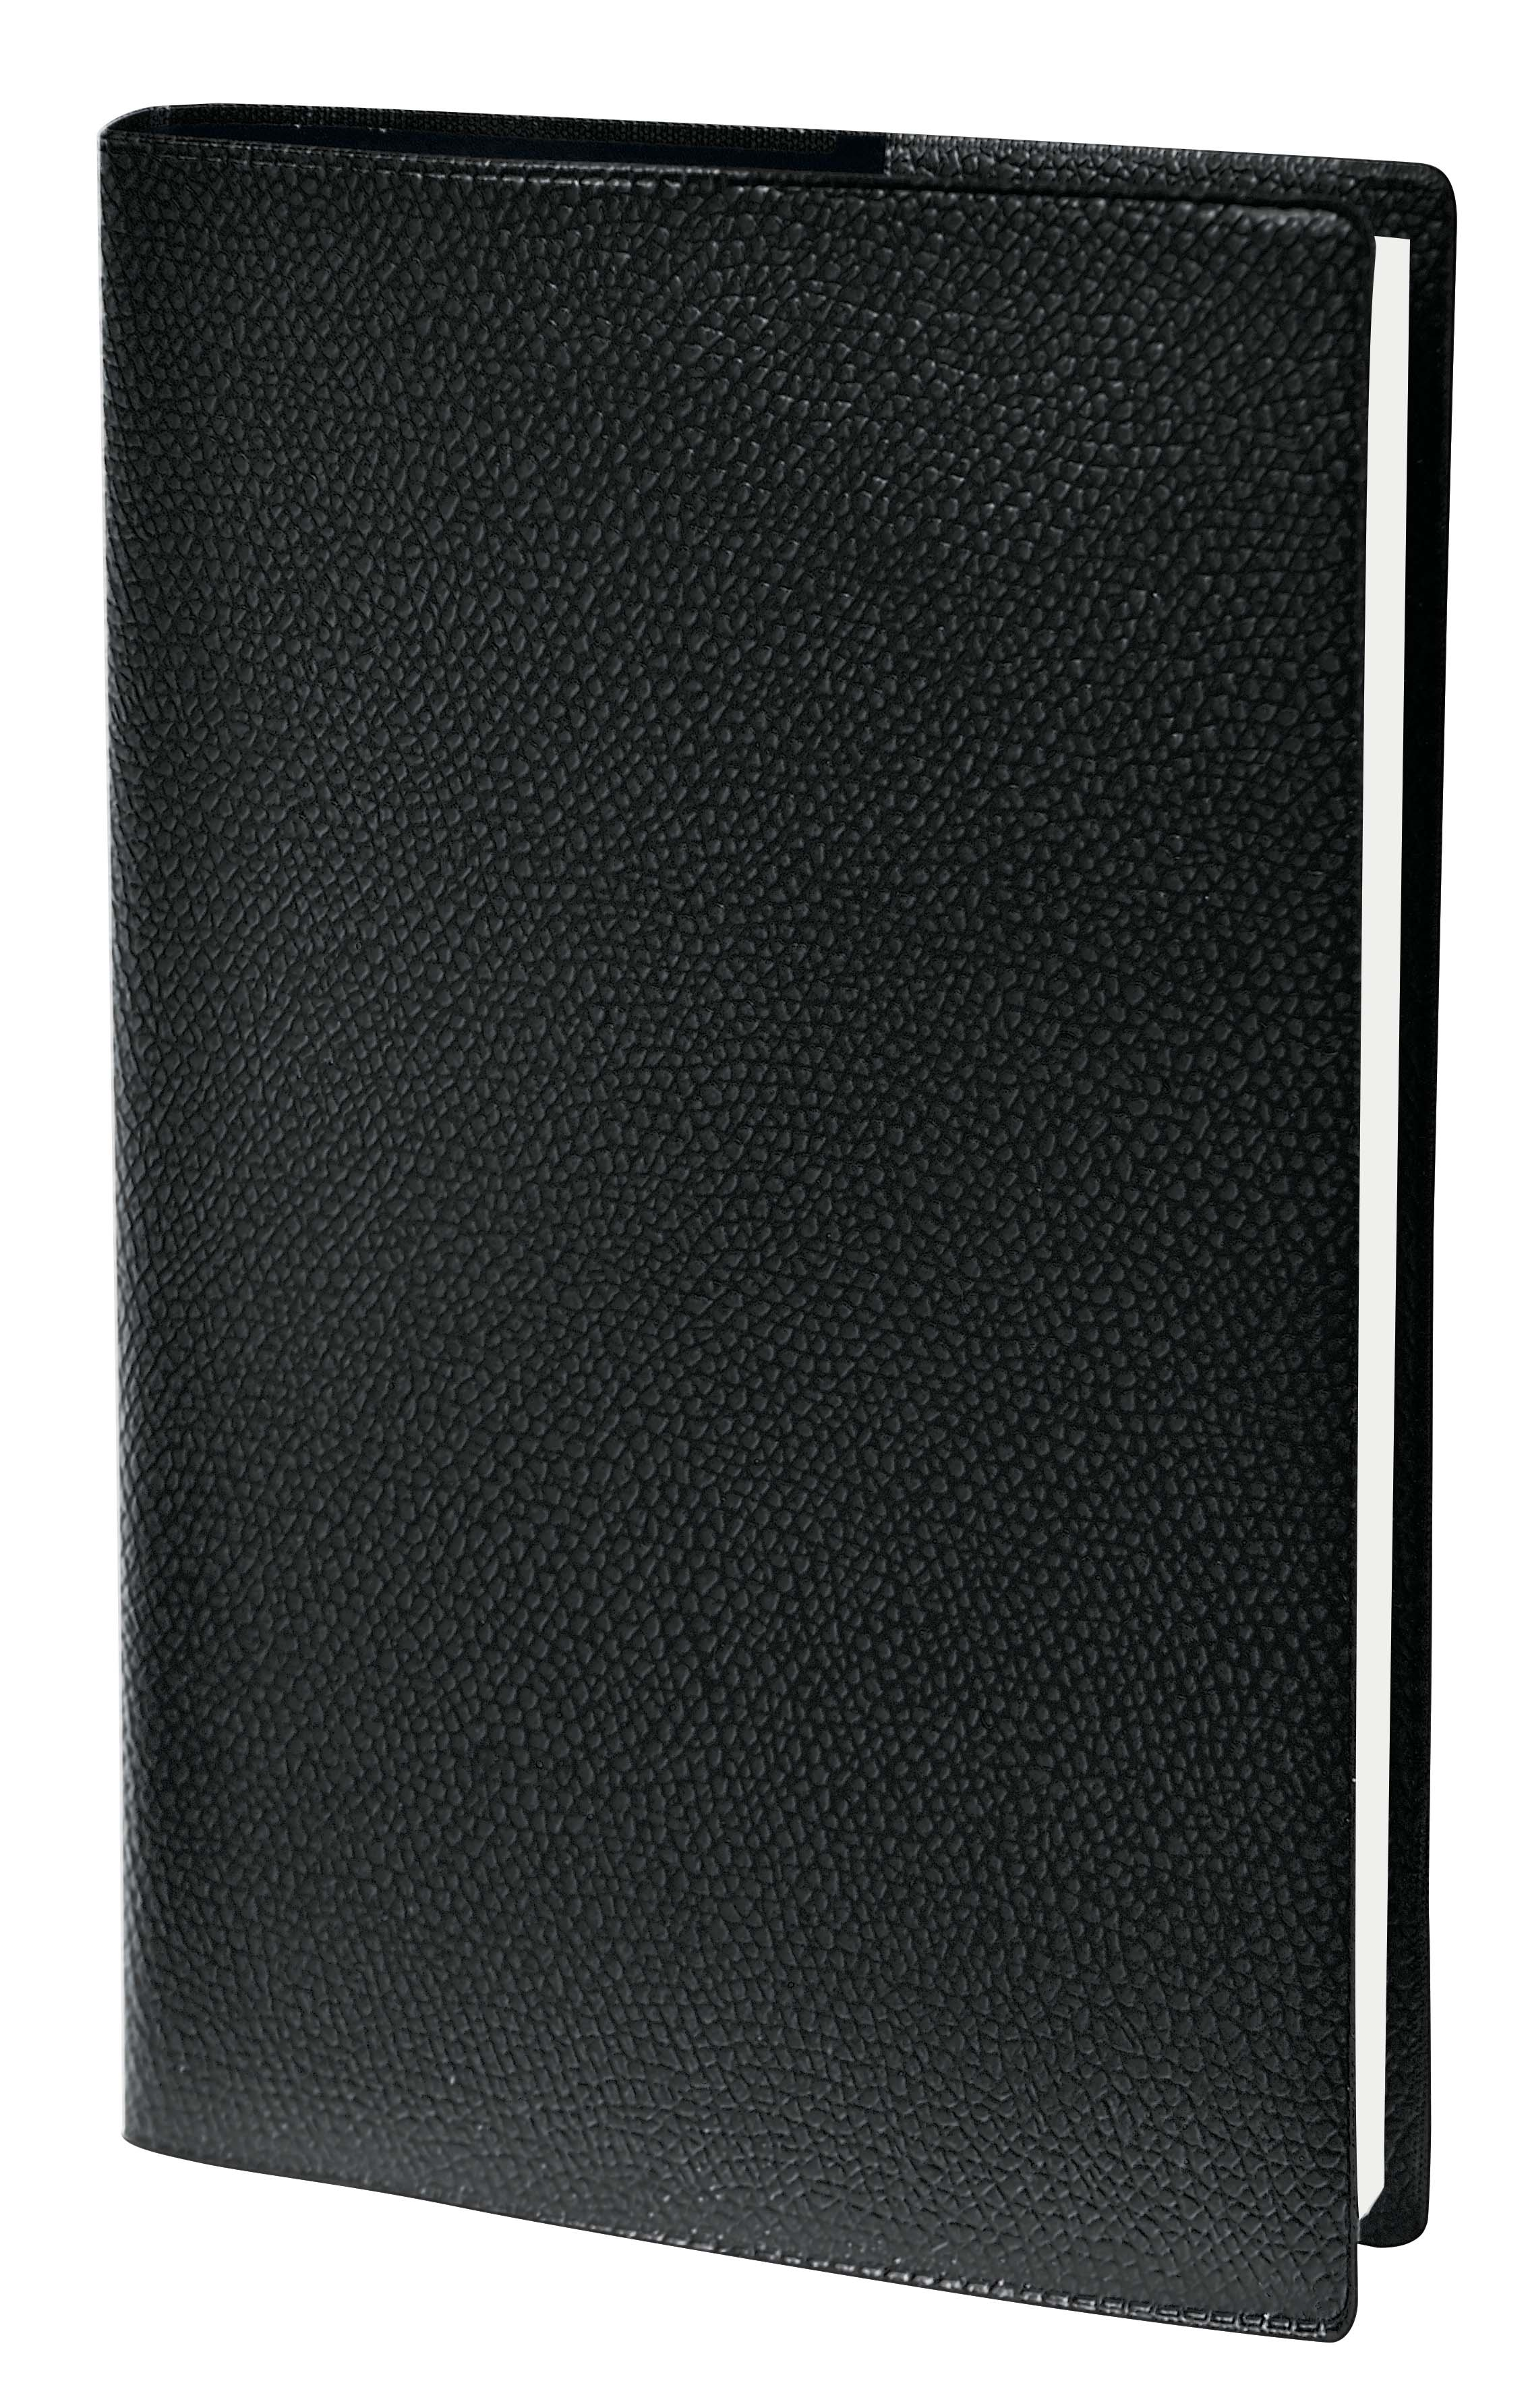 Agenda Impala 1 semaine sur 2 pages - 18 x 24 cm - noir - Quo Vadis